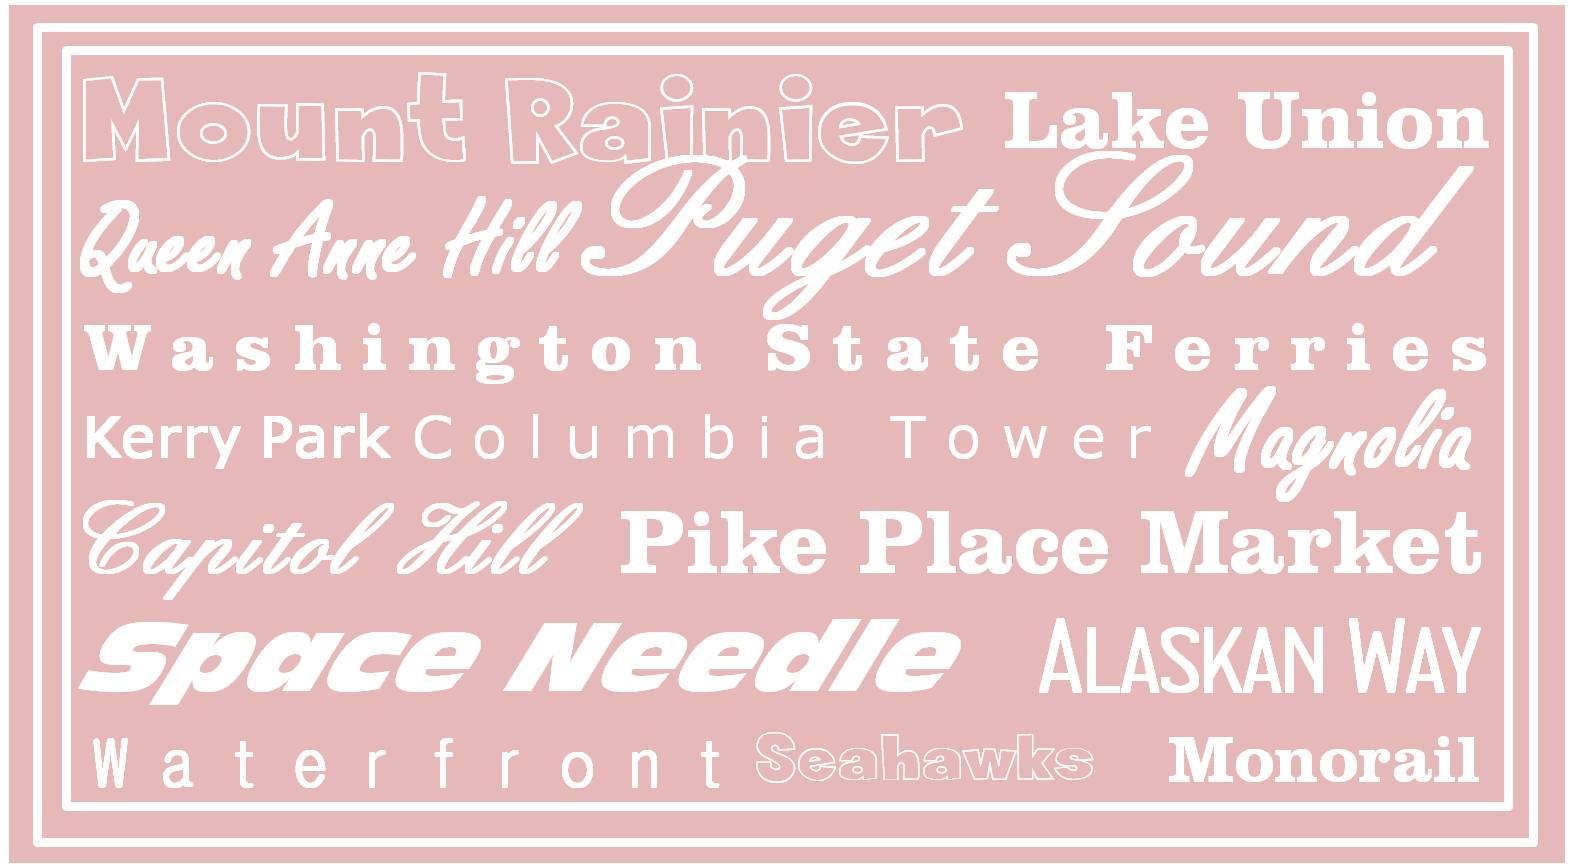 http://3.bp.blogspot.com/-rVJ4HKLImMQ/T5LRewi47MI/AAAAAAAAAJw/6mIslm_C04k/s1600/Download_Seattle_lightpink.jpg